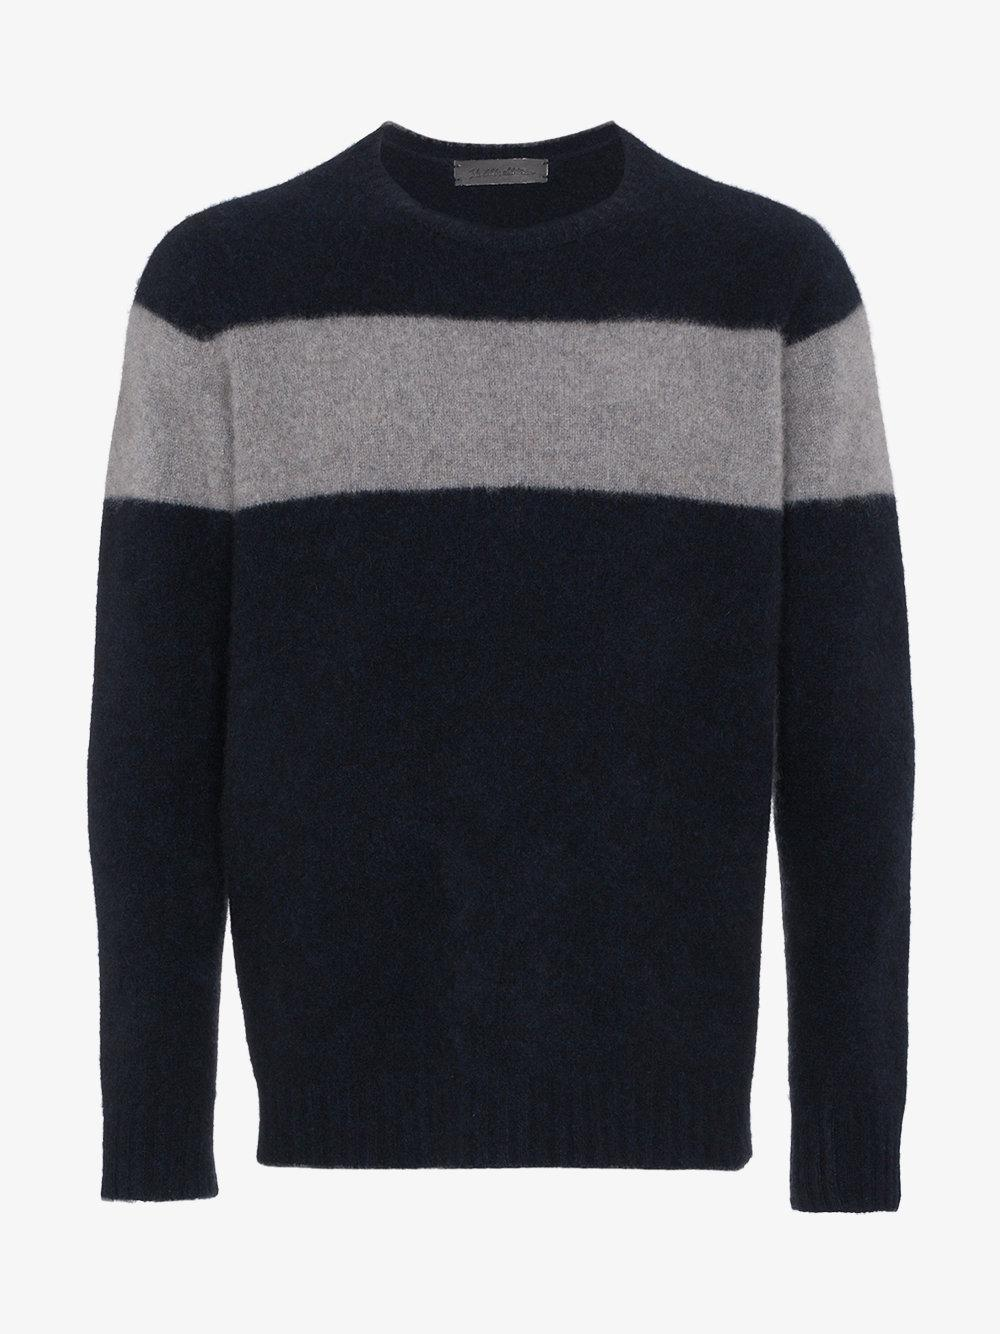 4534467e the-elder-statesman-Blue-Striped-Cashmere-Sweater.jpeg